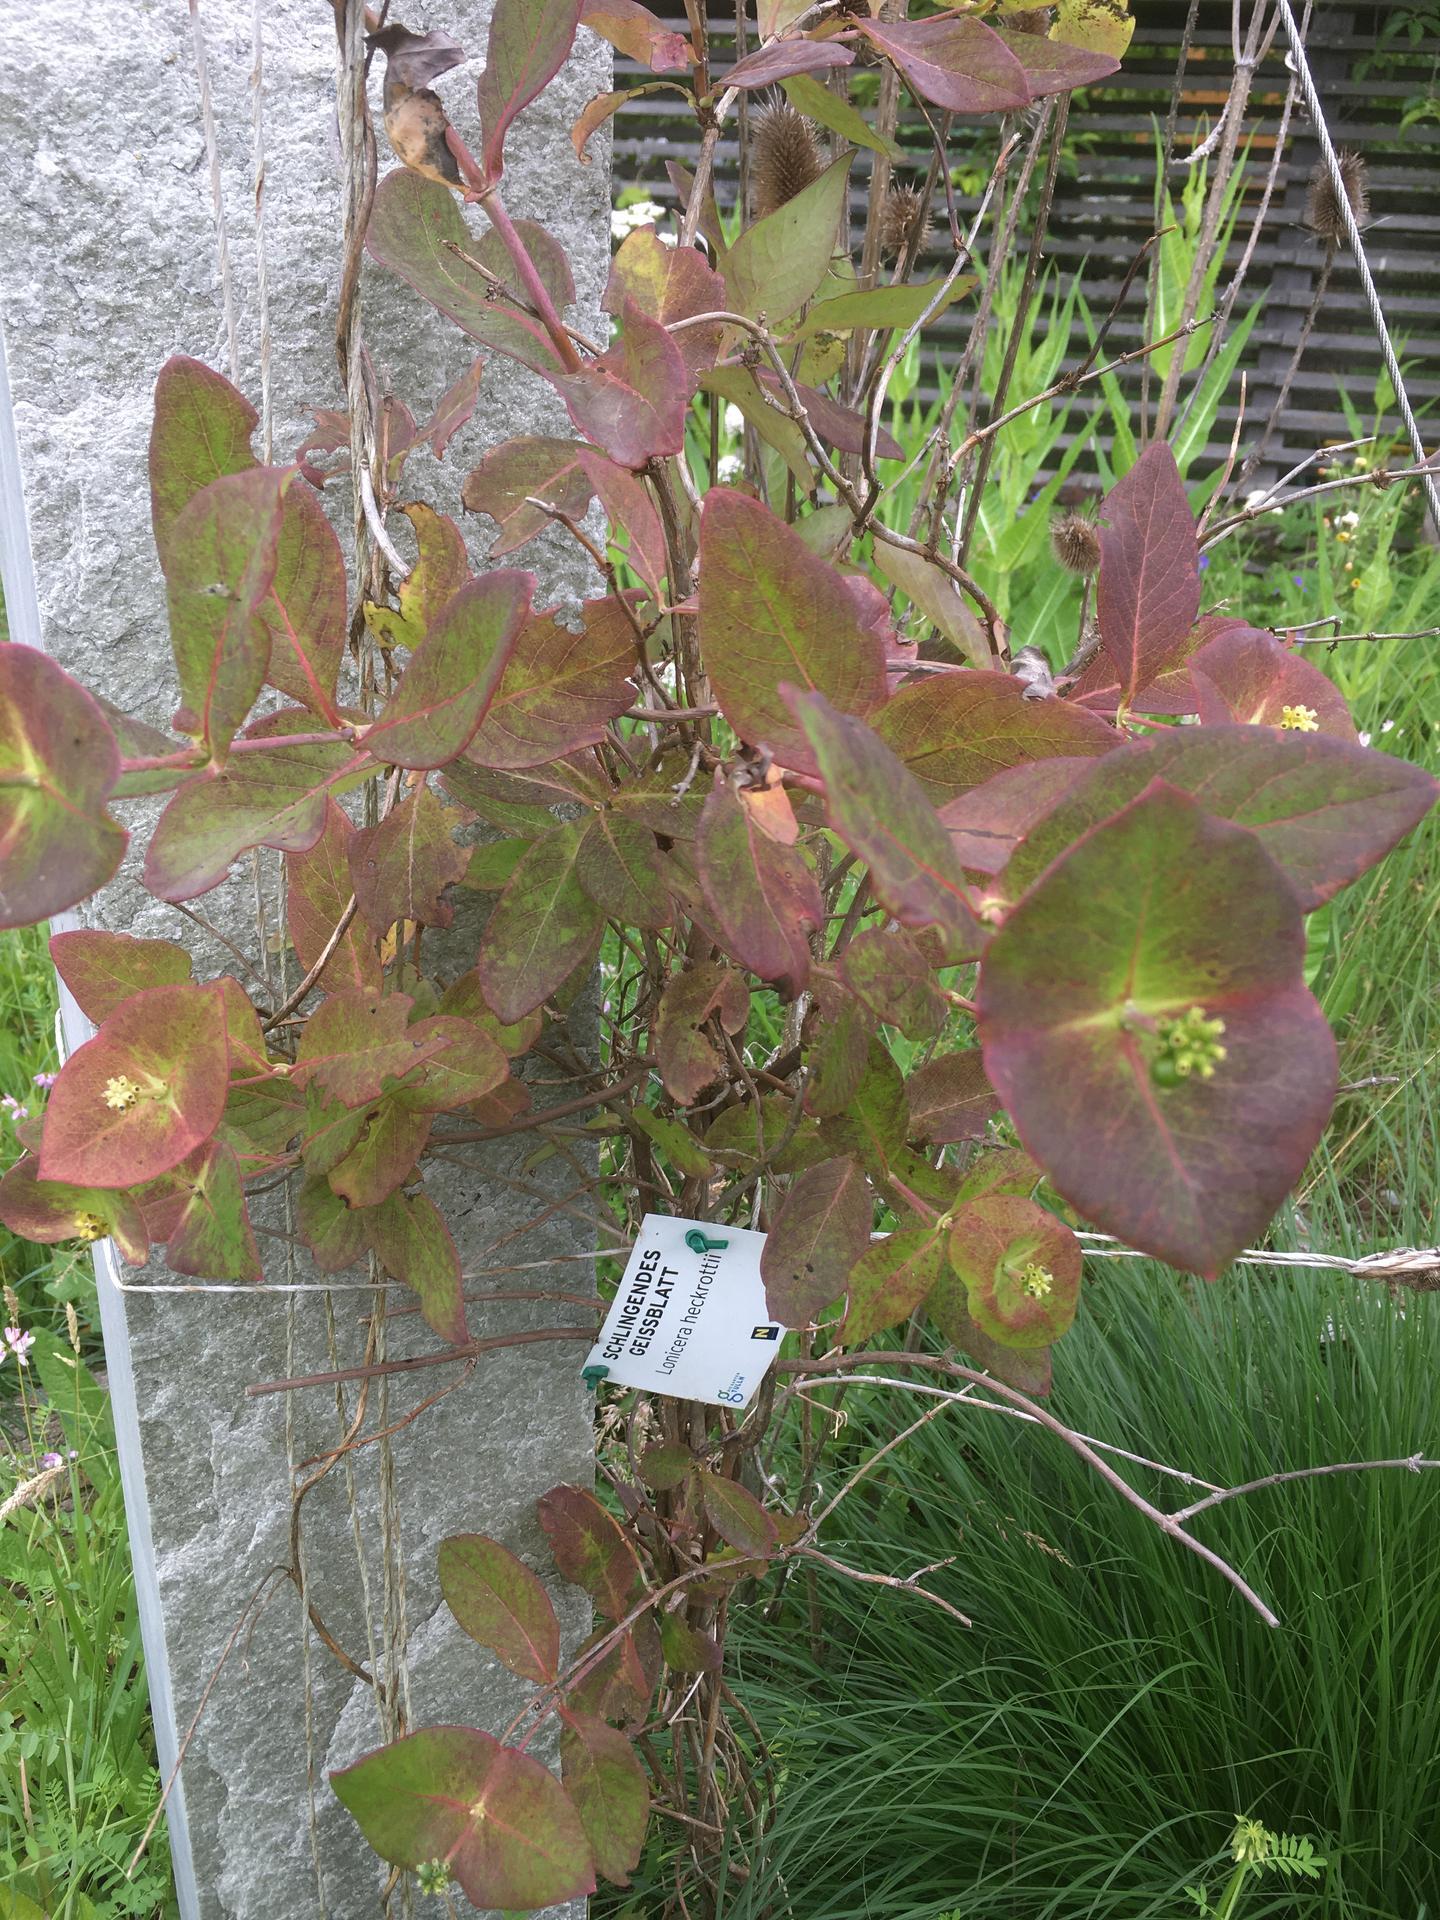 2020 😍 🌞 - Na vylete za inspiraci v zahradach v Tullnu (Rakousko) - zimolez Heckrottuv s prekvapive nacervenalymi listy